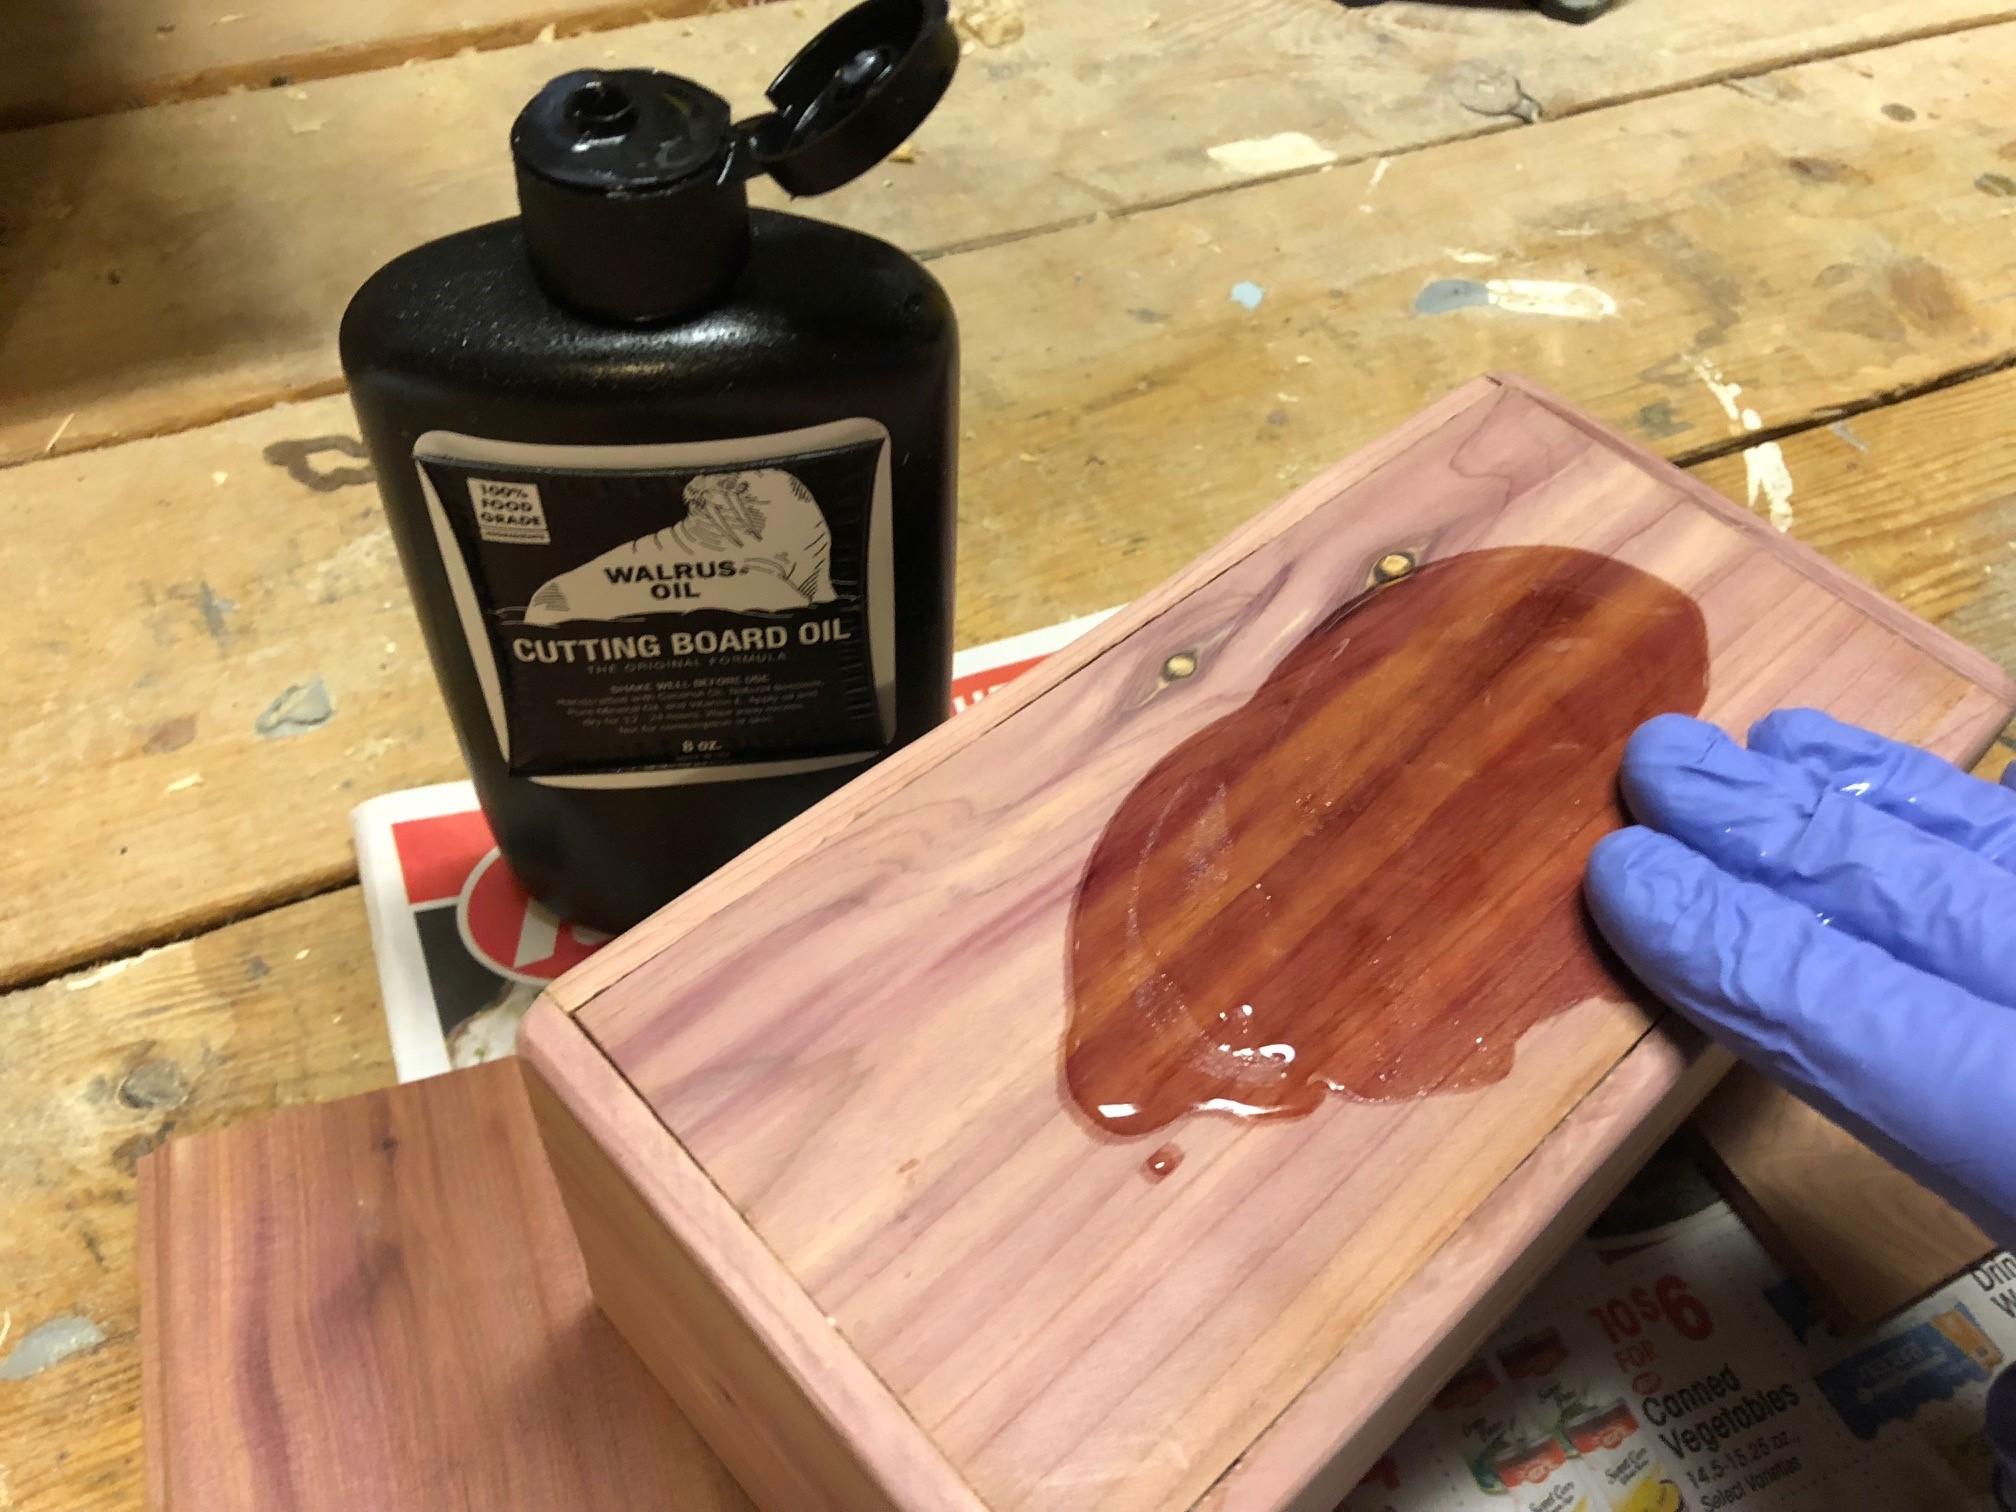 Oiling magic tissue box